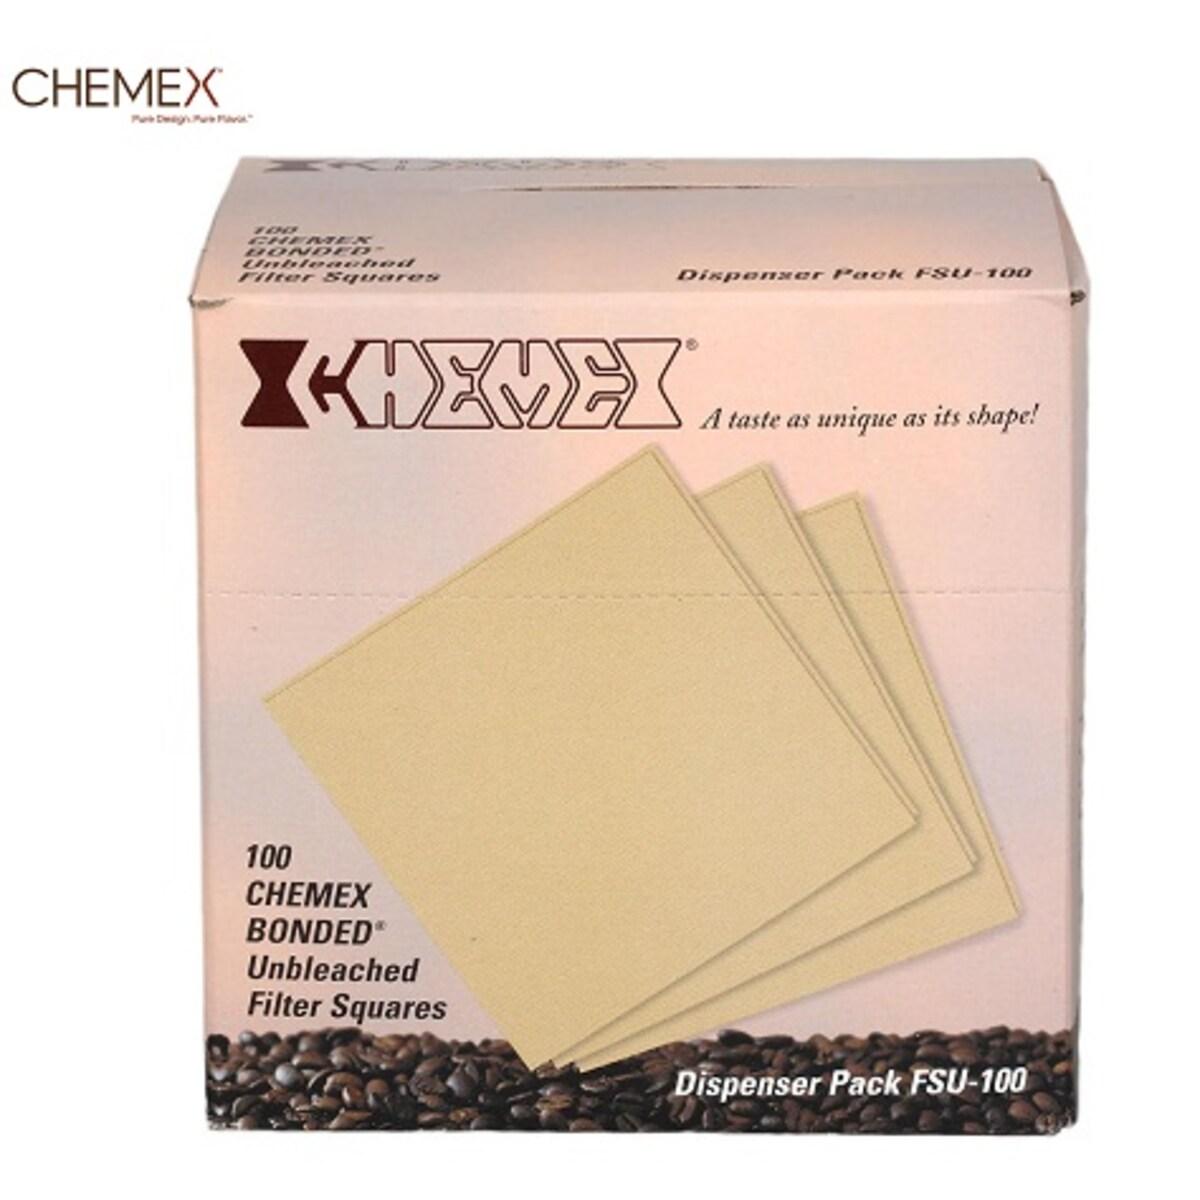 Chemex филтри, 6 чаши